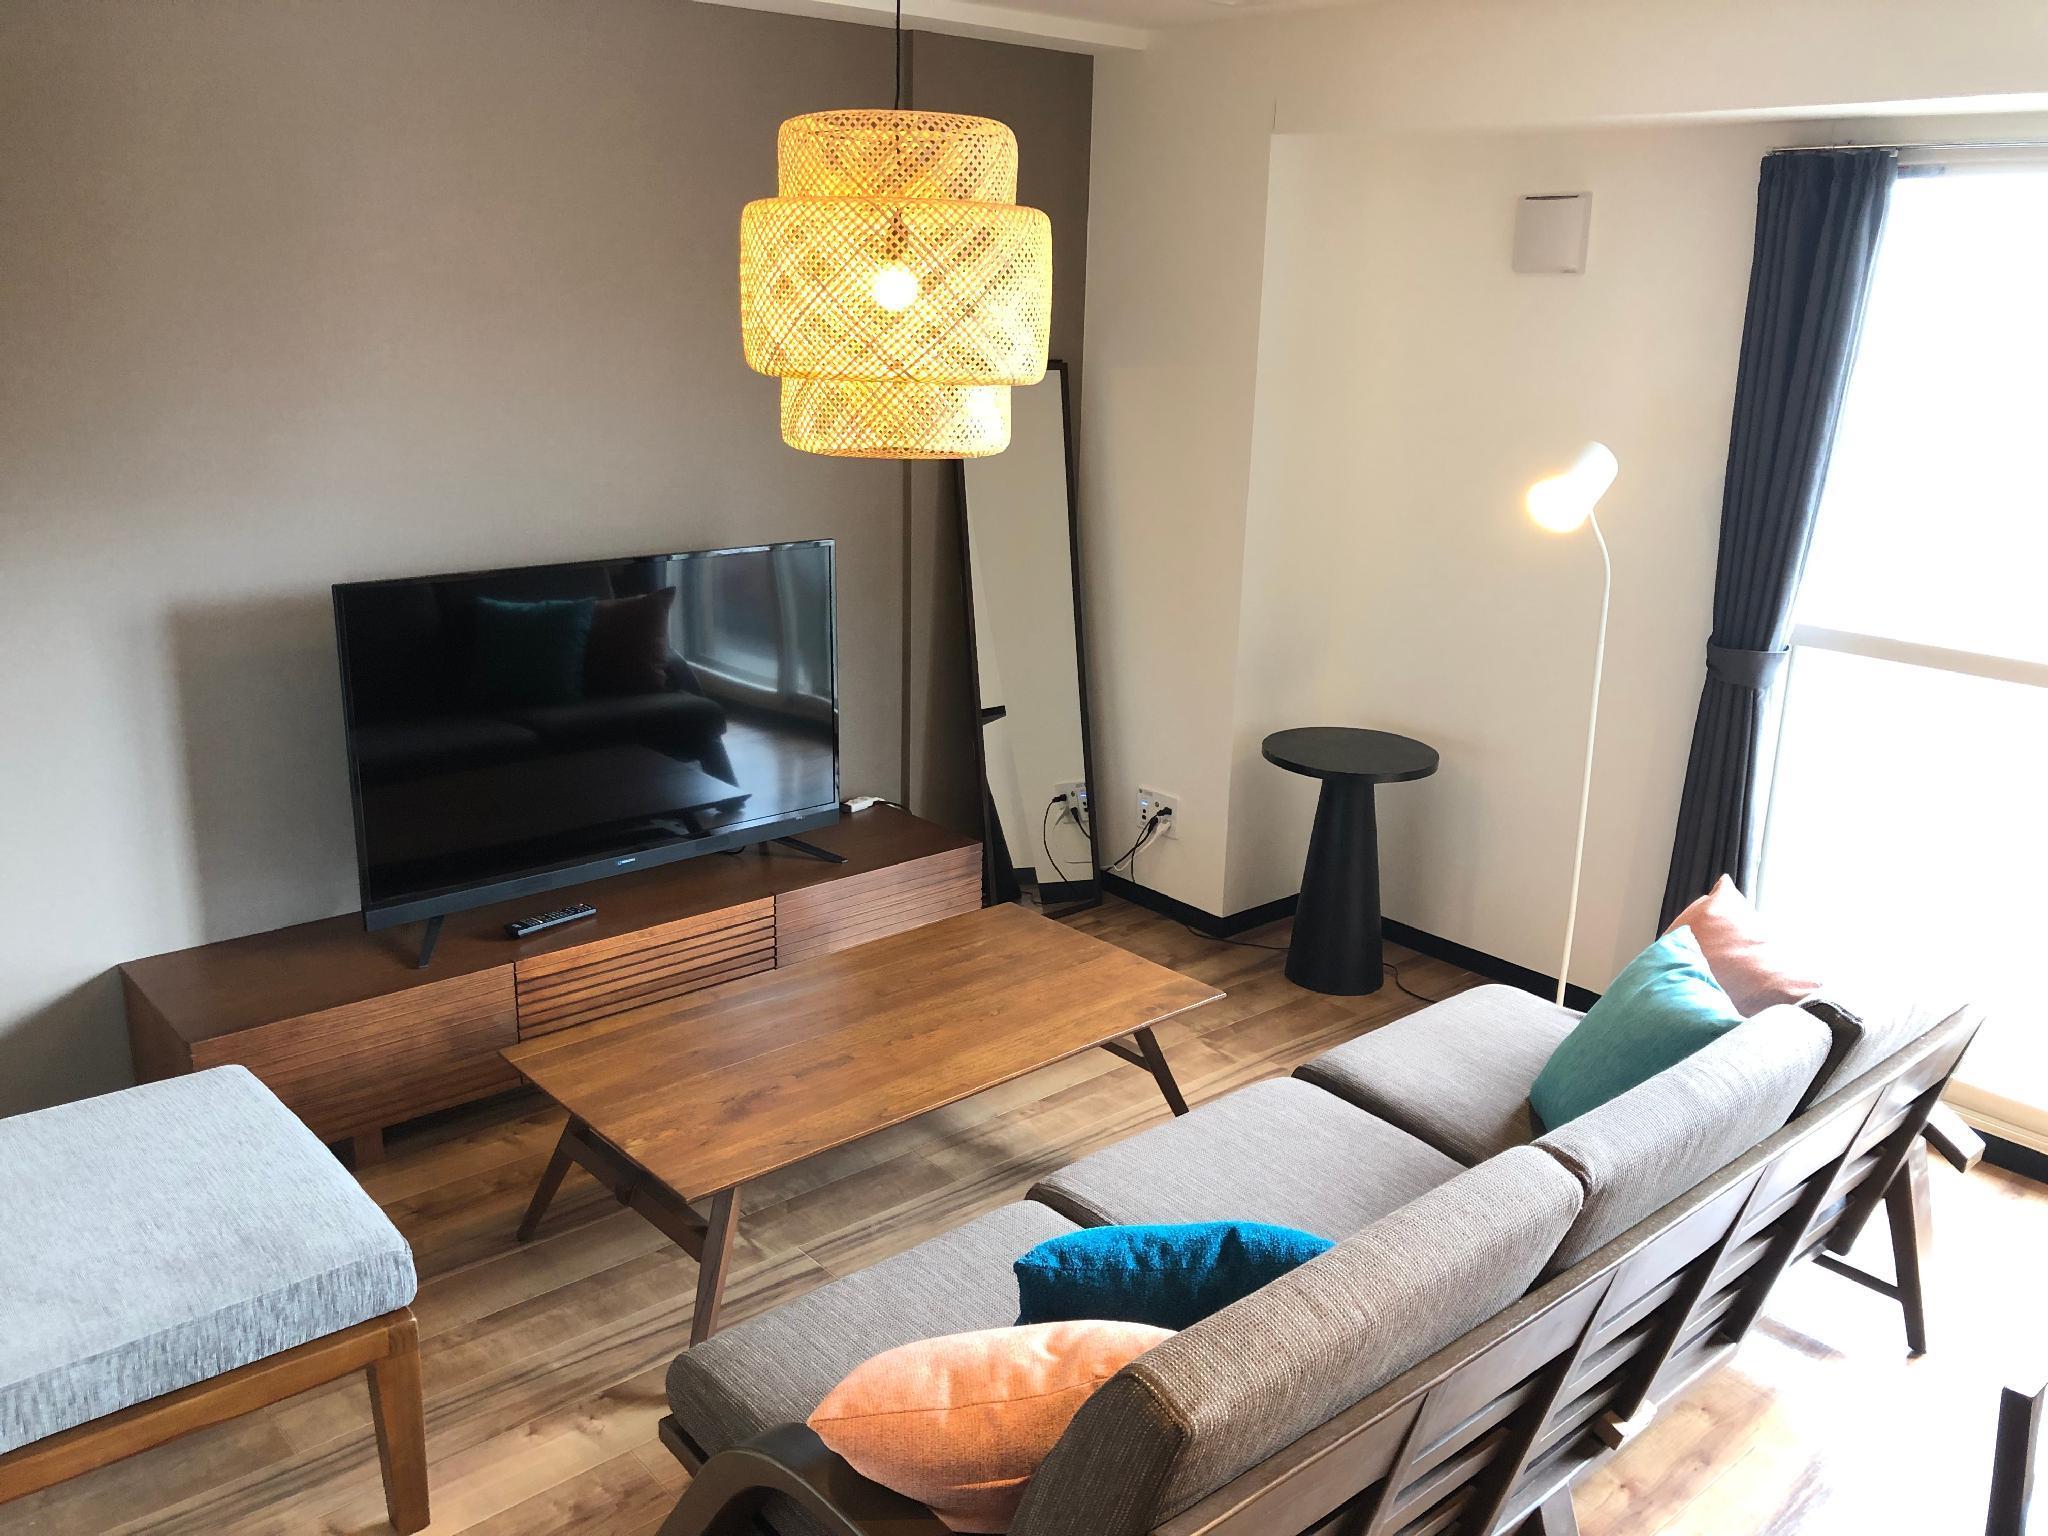 S4 96 2 Bedroom Apartment In Sapporo